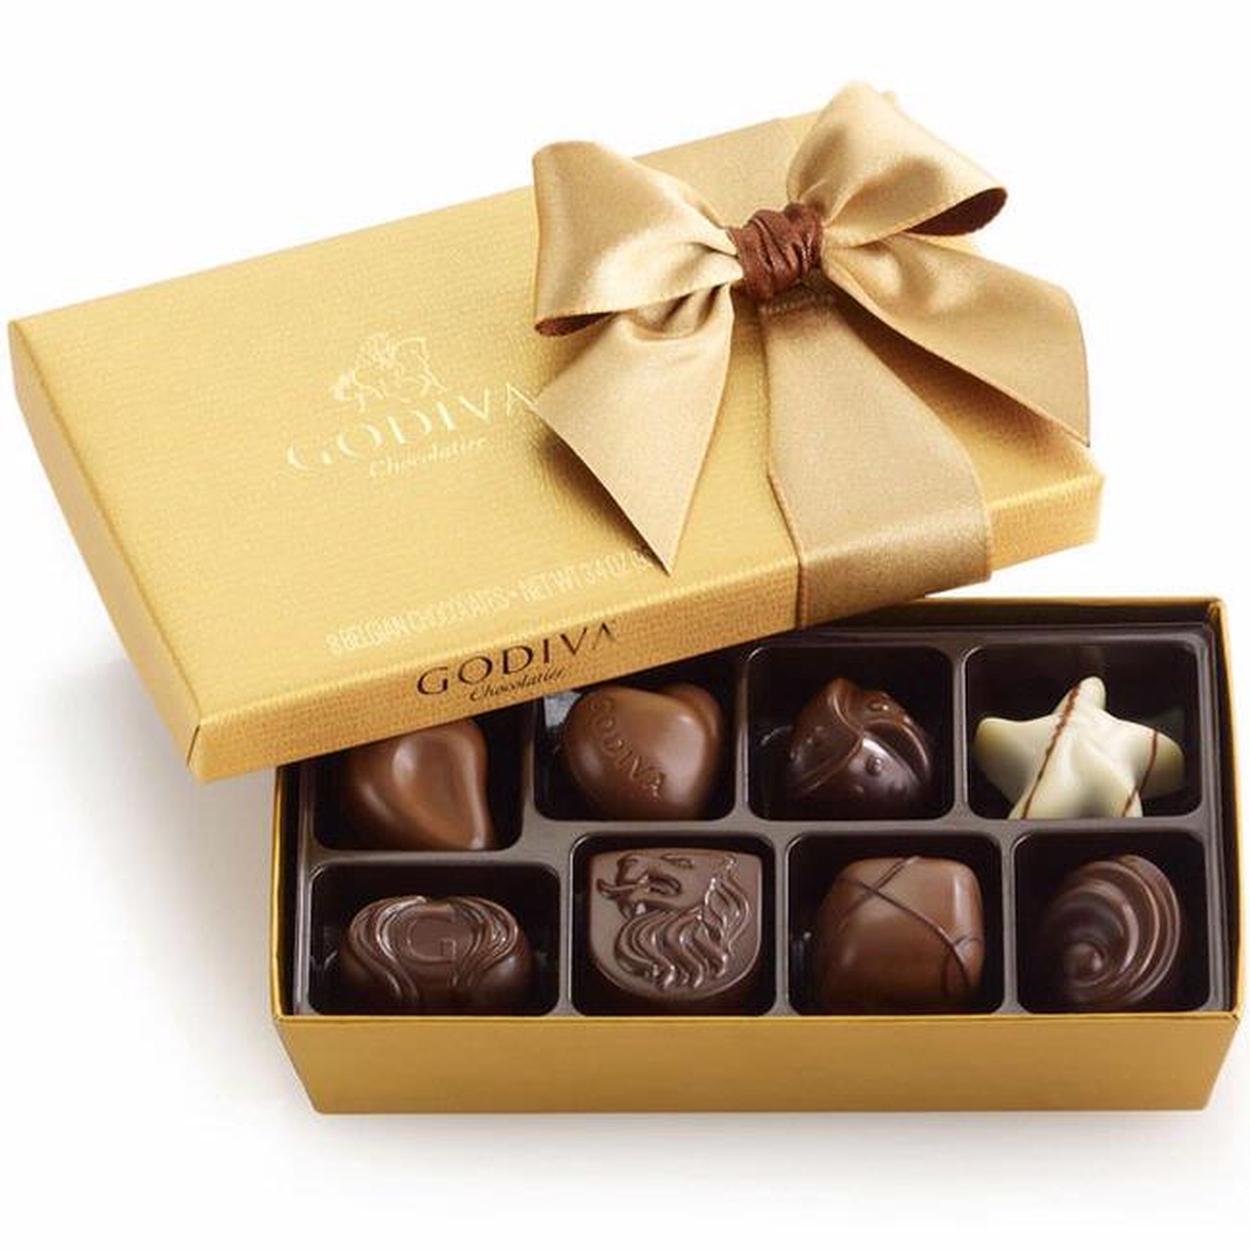 Godiva gold ballotin chocolate truffle gift box 8 pc chocolate godiva gold ballotin chocolate truffle gift box 8 pc chocolate gift boxes bulk chocolate oh nuts negle Choice Image